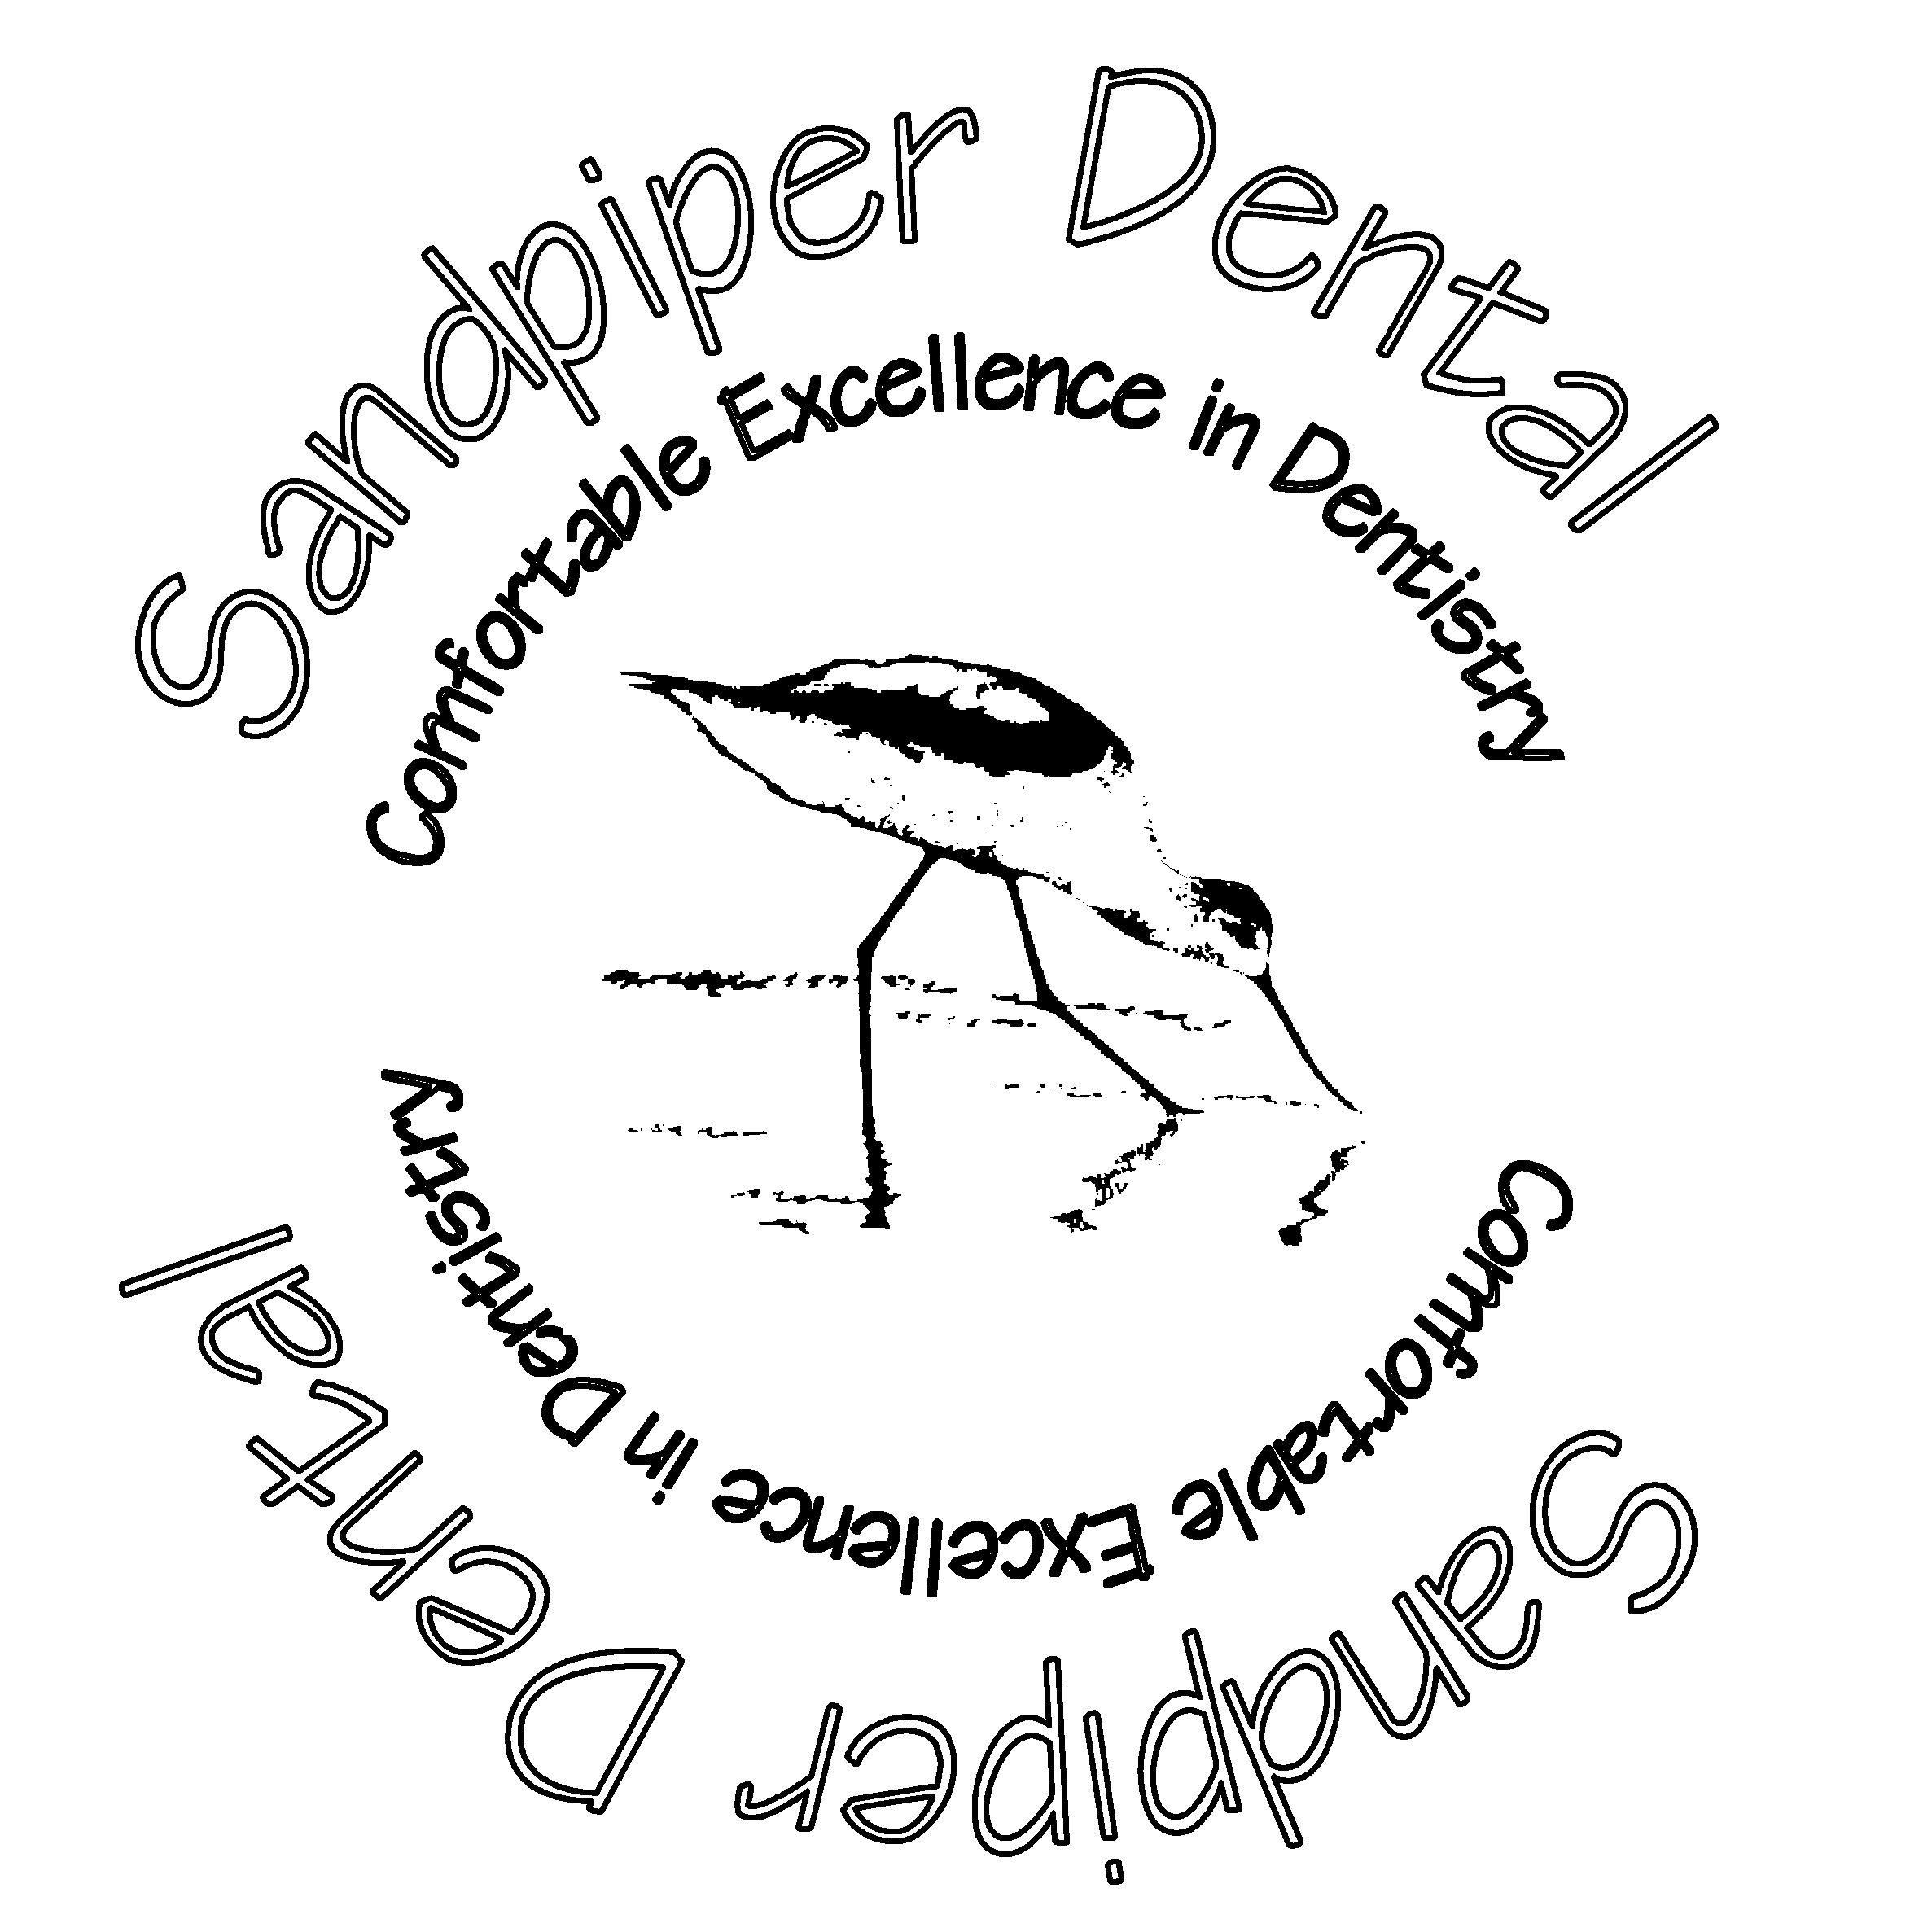 Sandpiper Dental - Brooklyn Park, MN 55443 - (763)561-7000 | ShowMeLocal.com